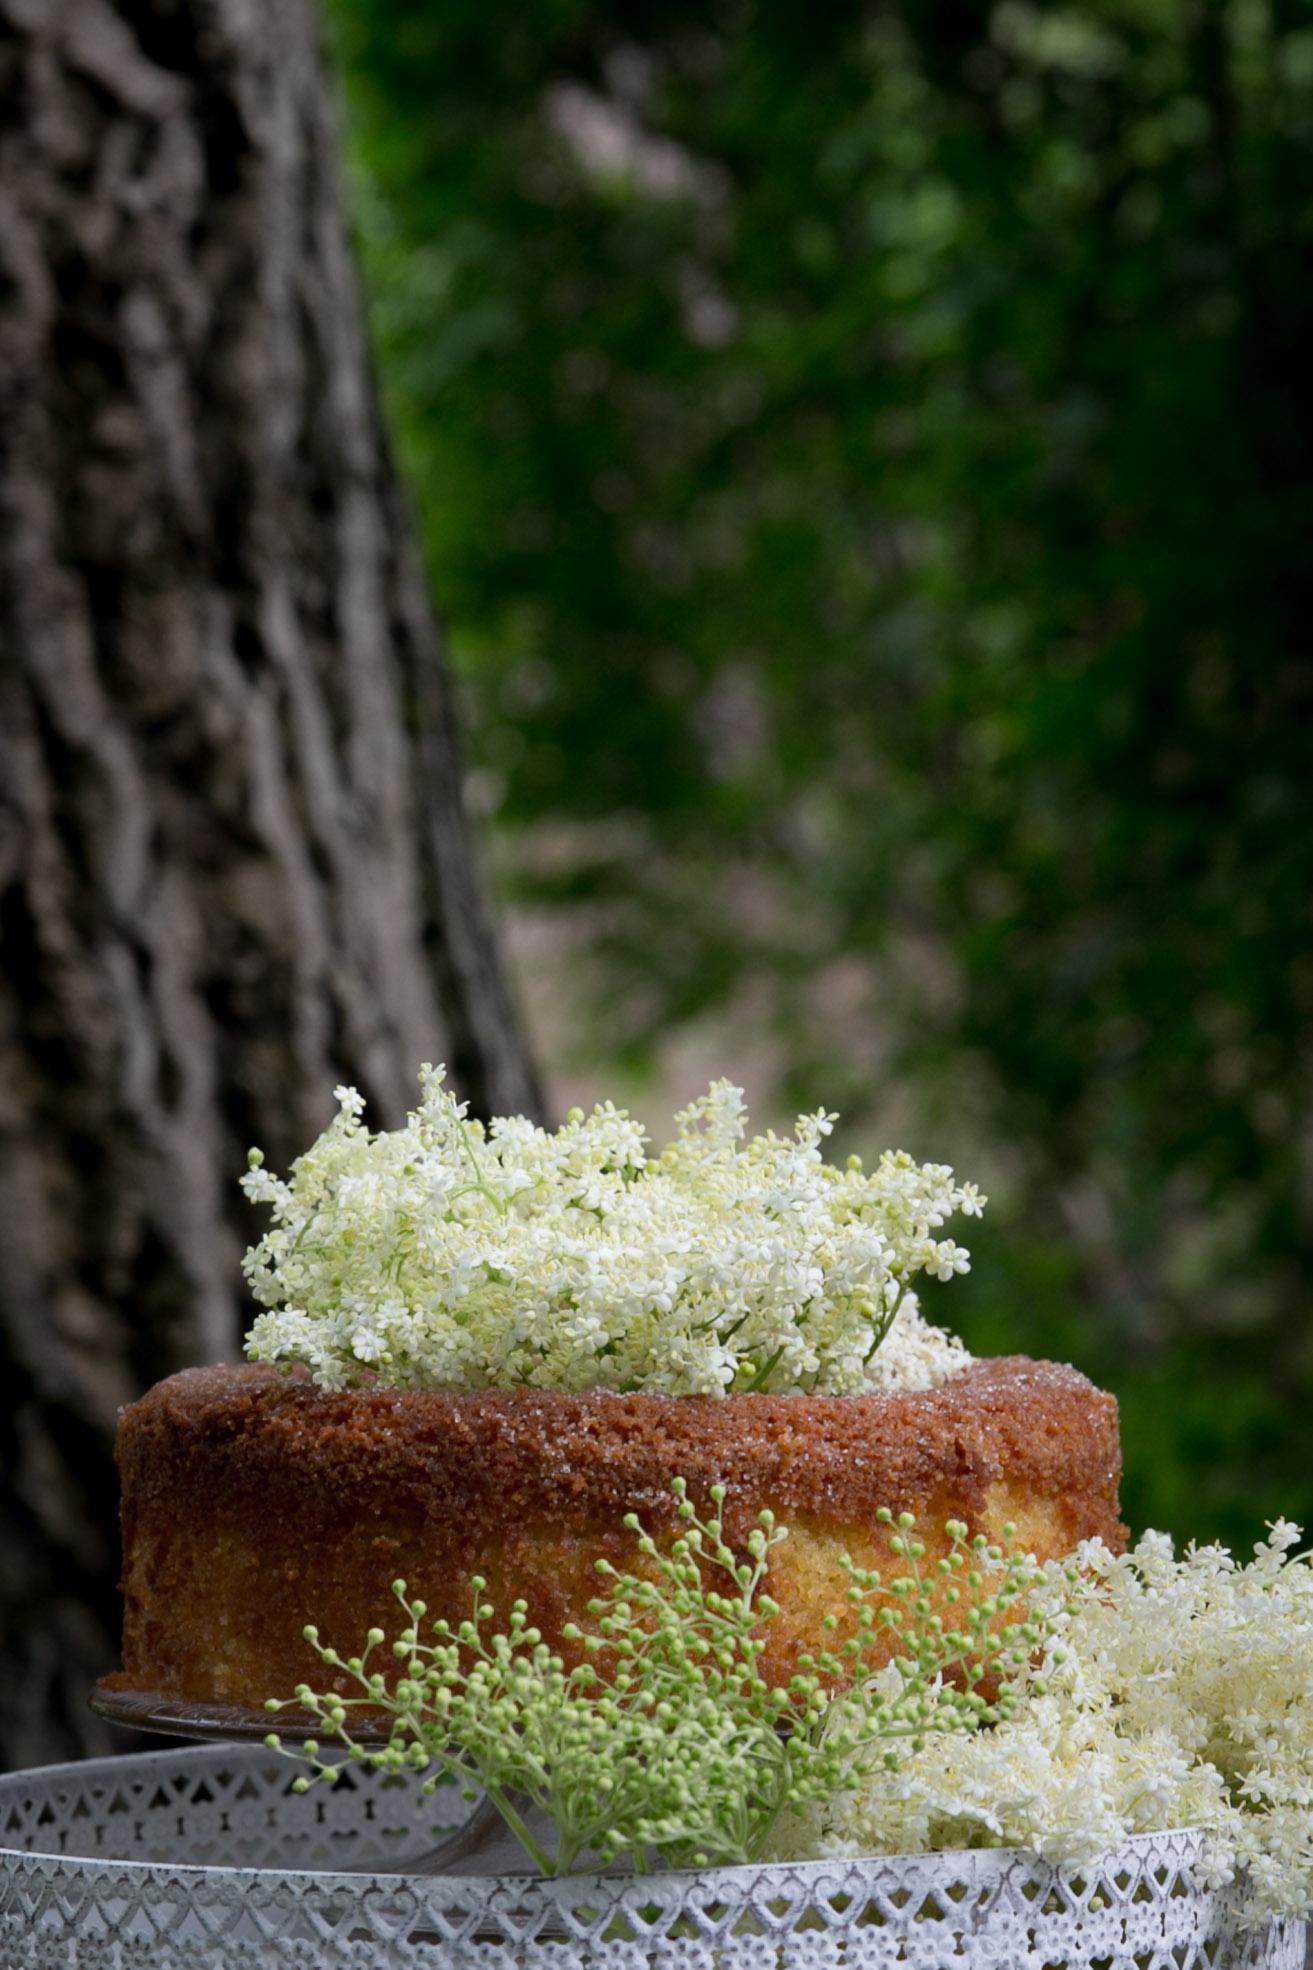 Cakes with elderflowers